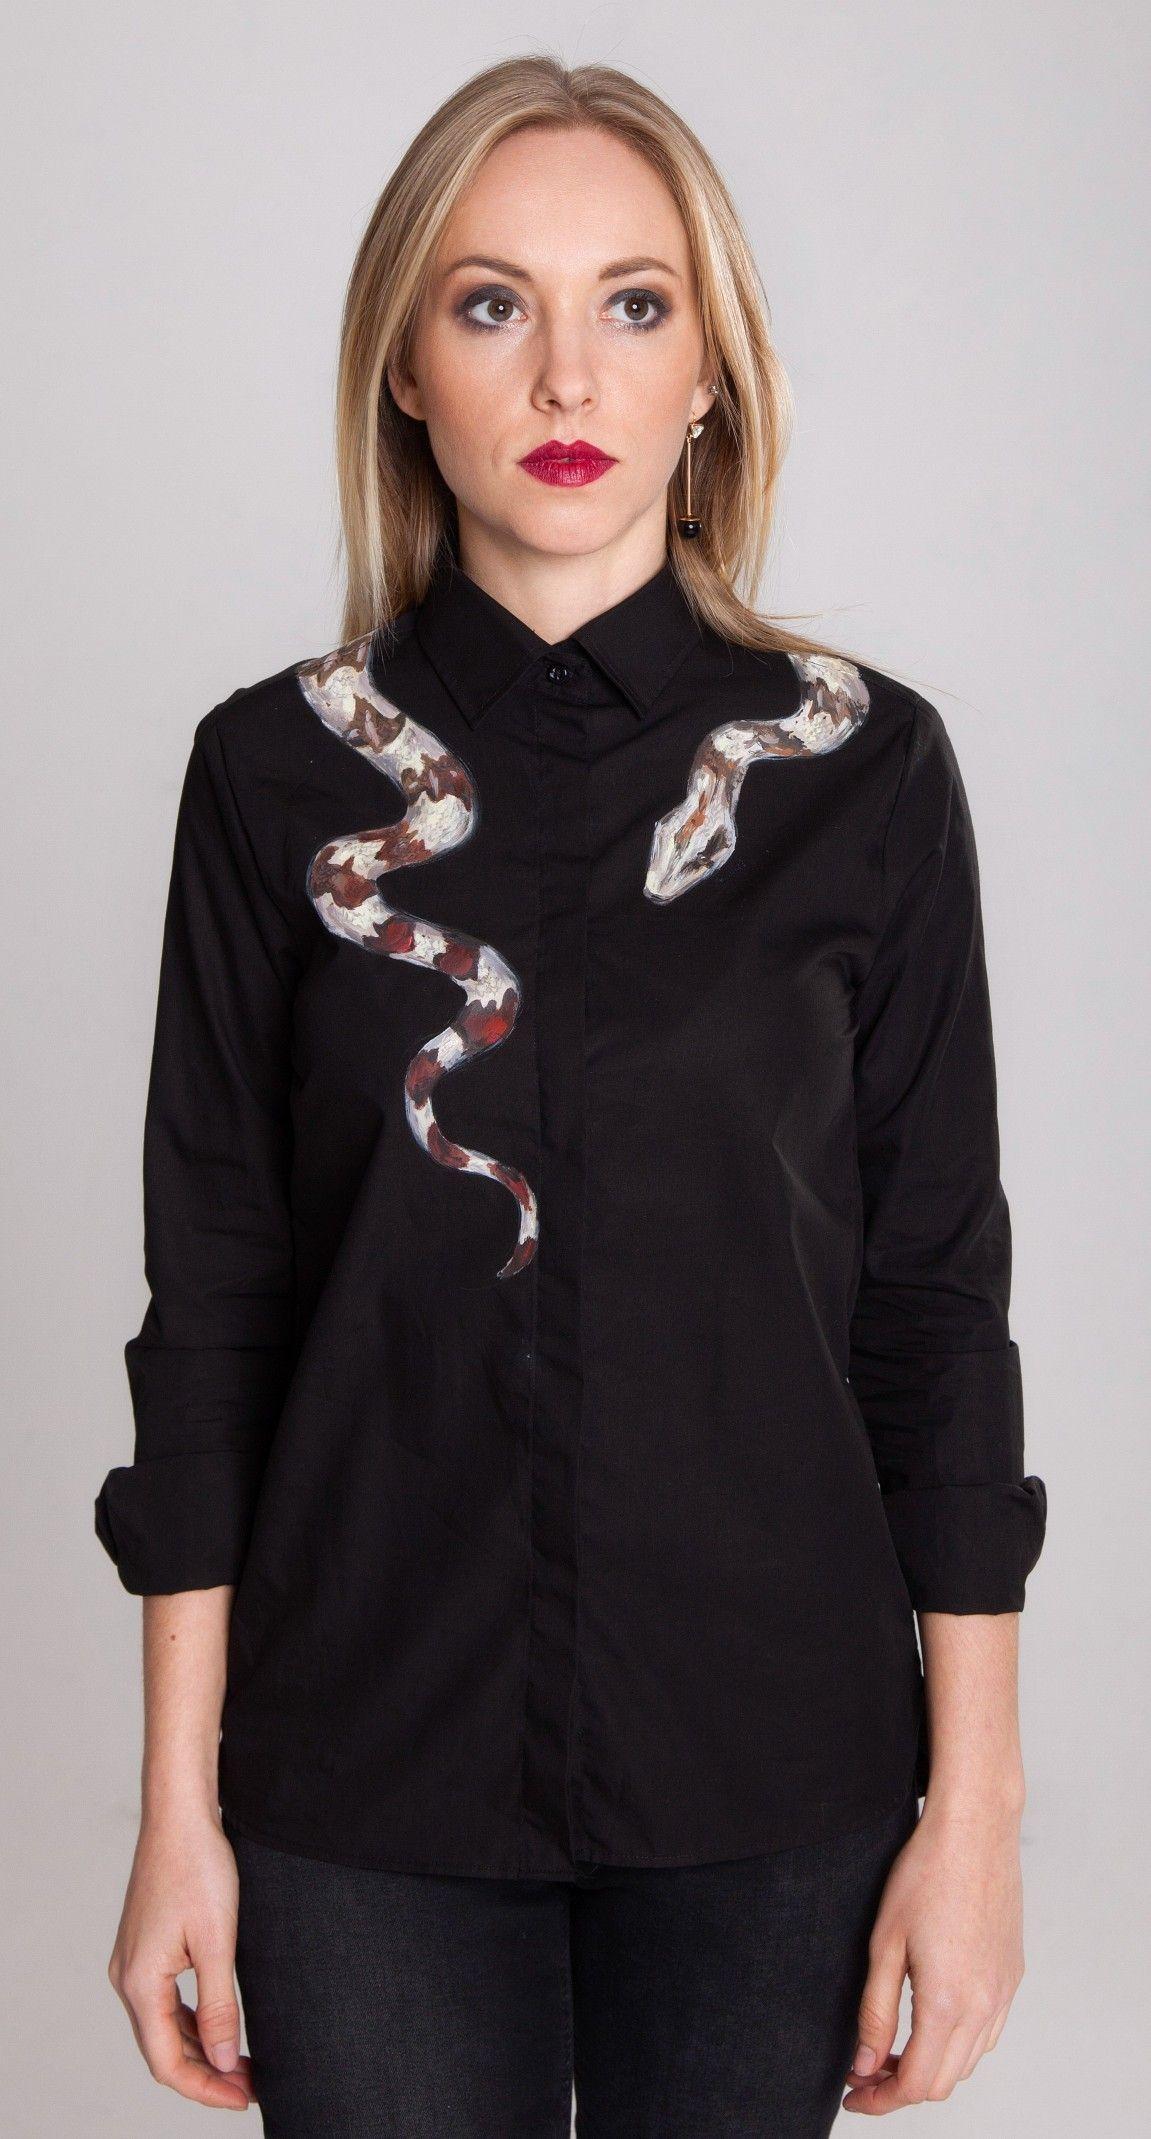 43d6fc2f9 Snake shirt Black button up shirt Black blouse Snake blouse Designer ...